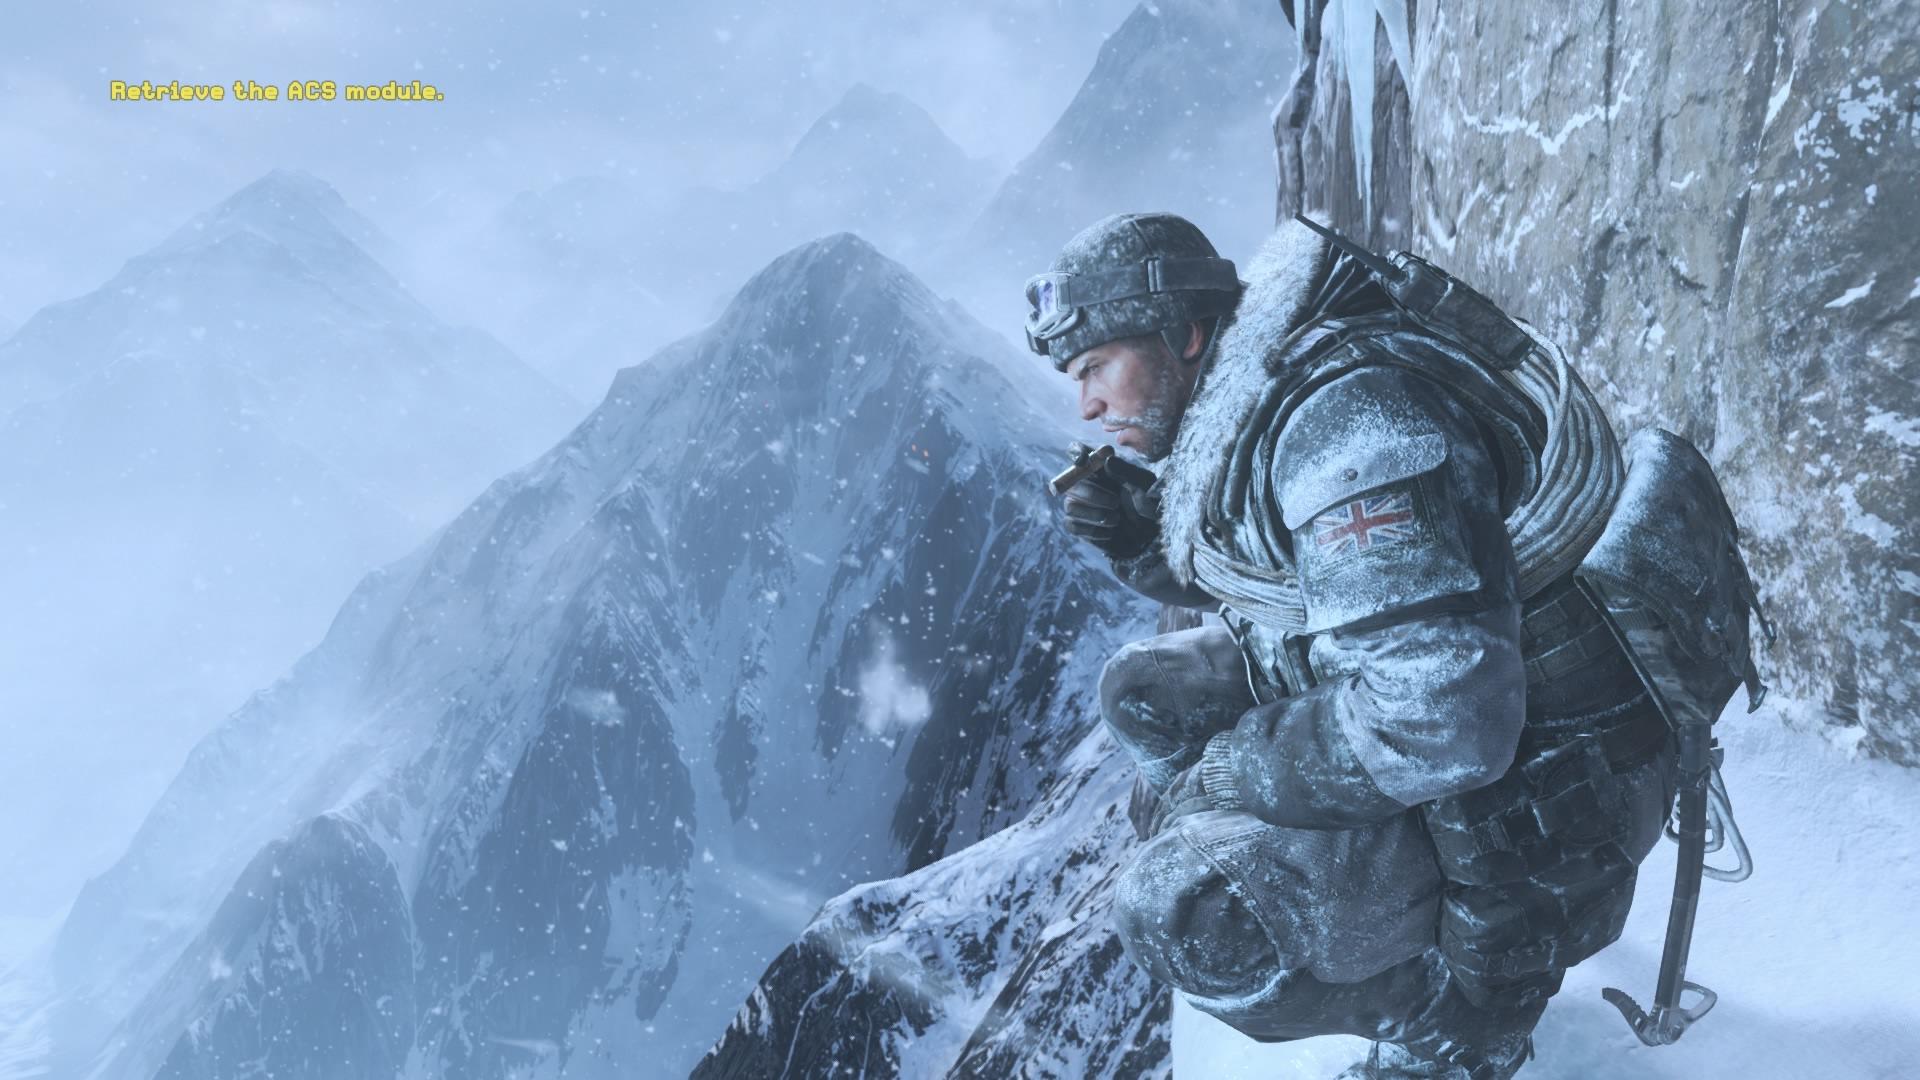 Soap MacTavish Call of Duty 8Bit/Digi